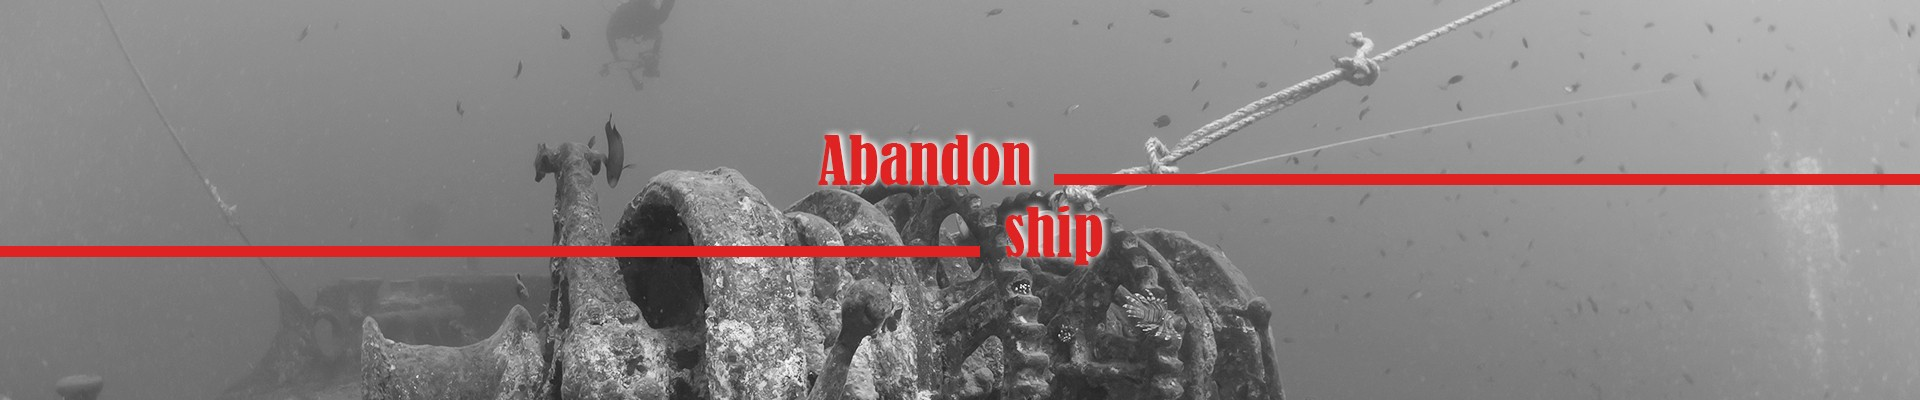 abandon-ship-scubadiver-shipwreck